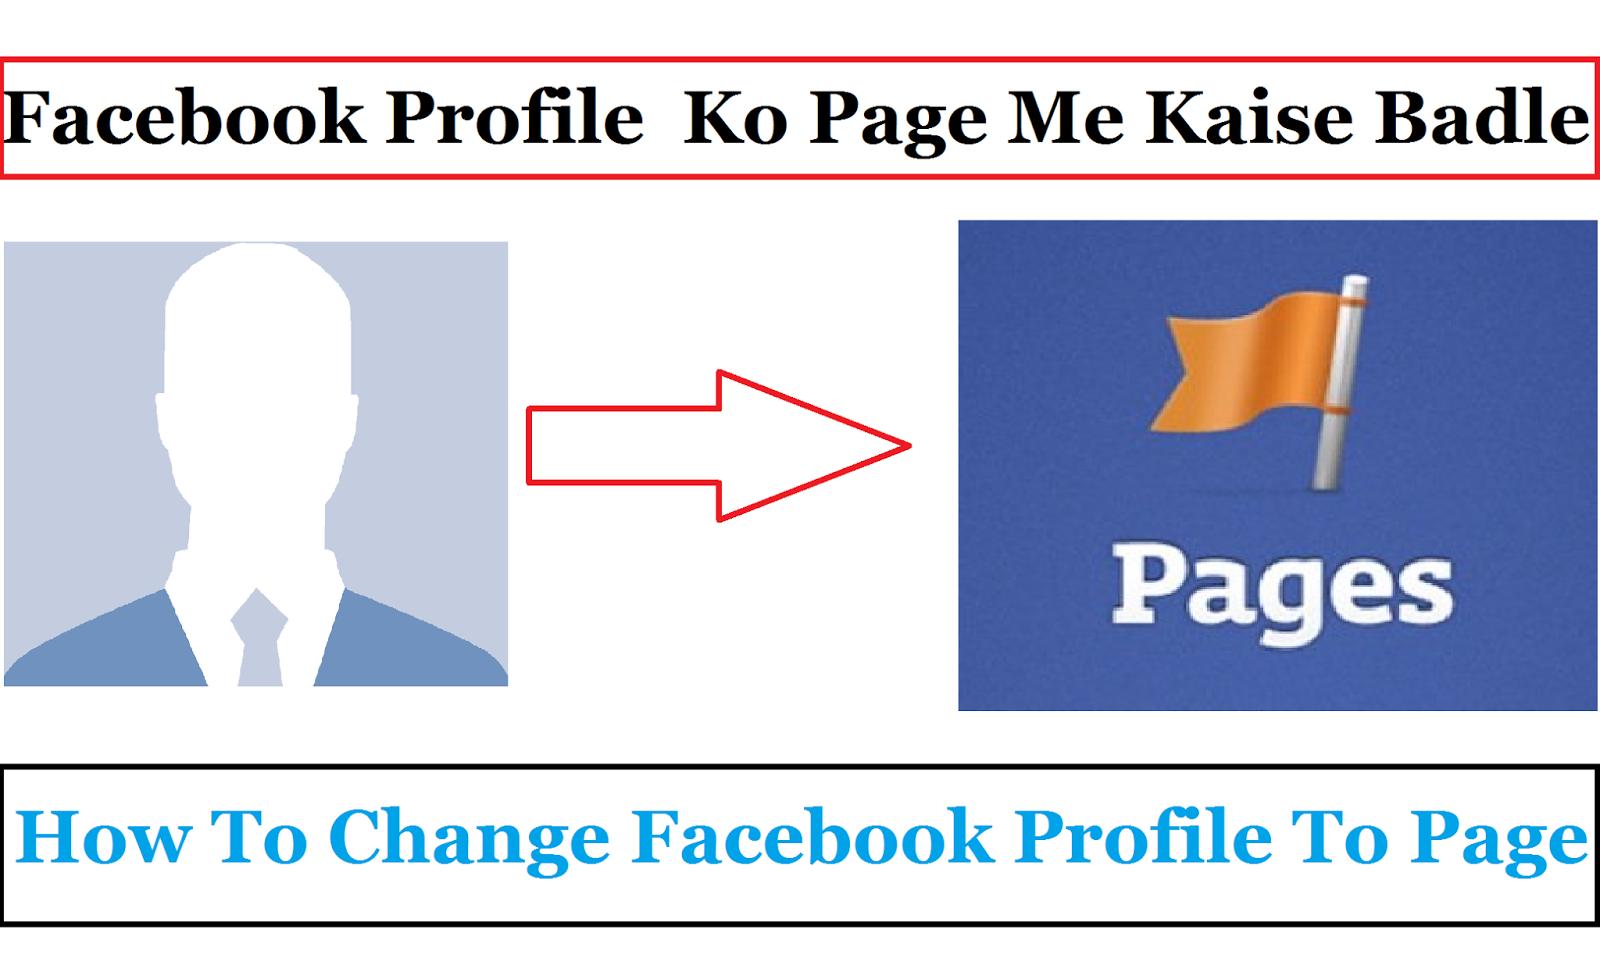 Facebookprofilekopagemekaiseconvertchange How To Delete A Facebook